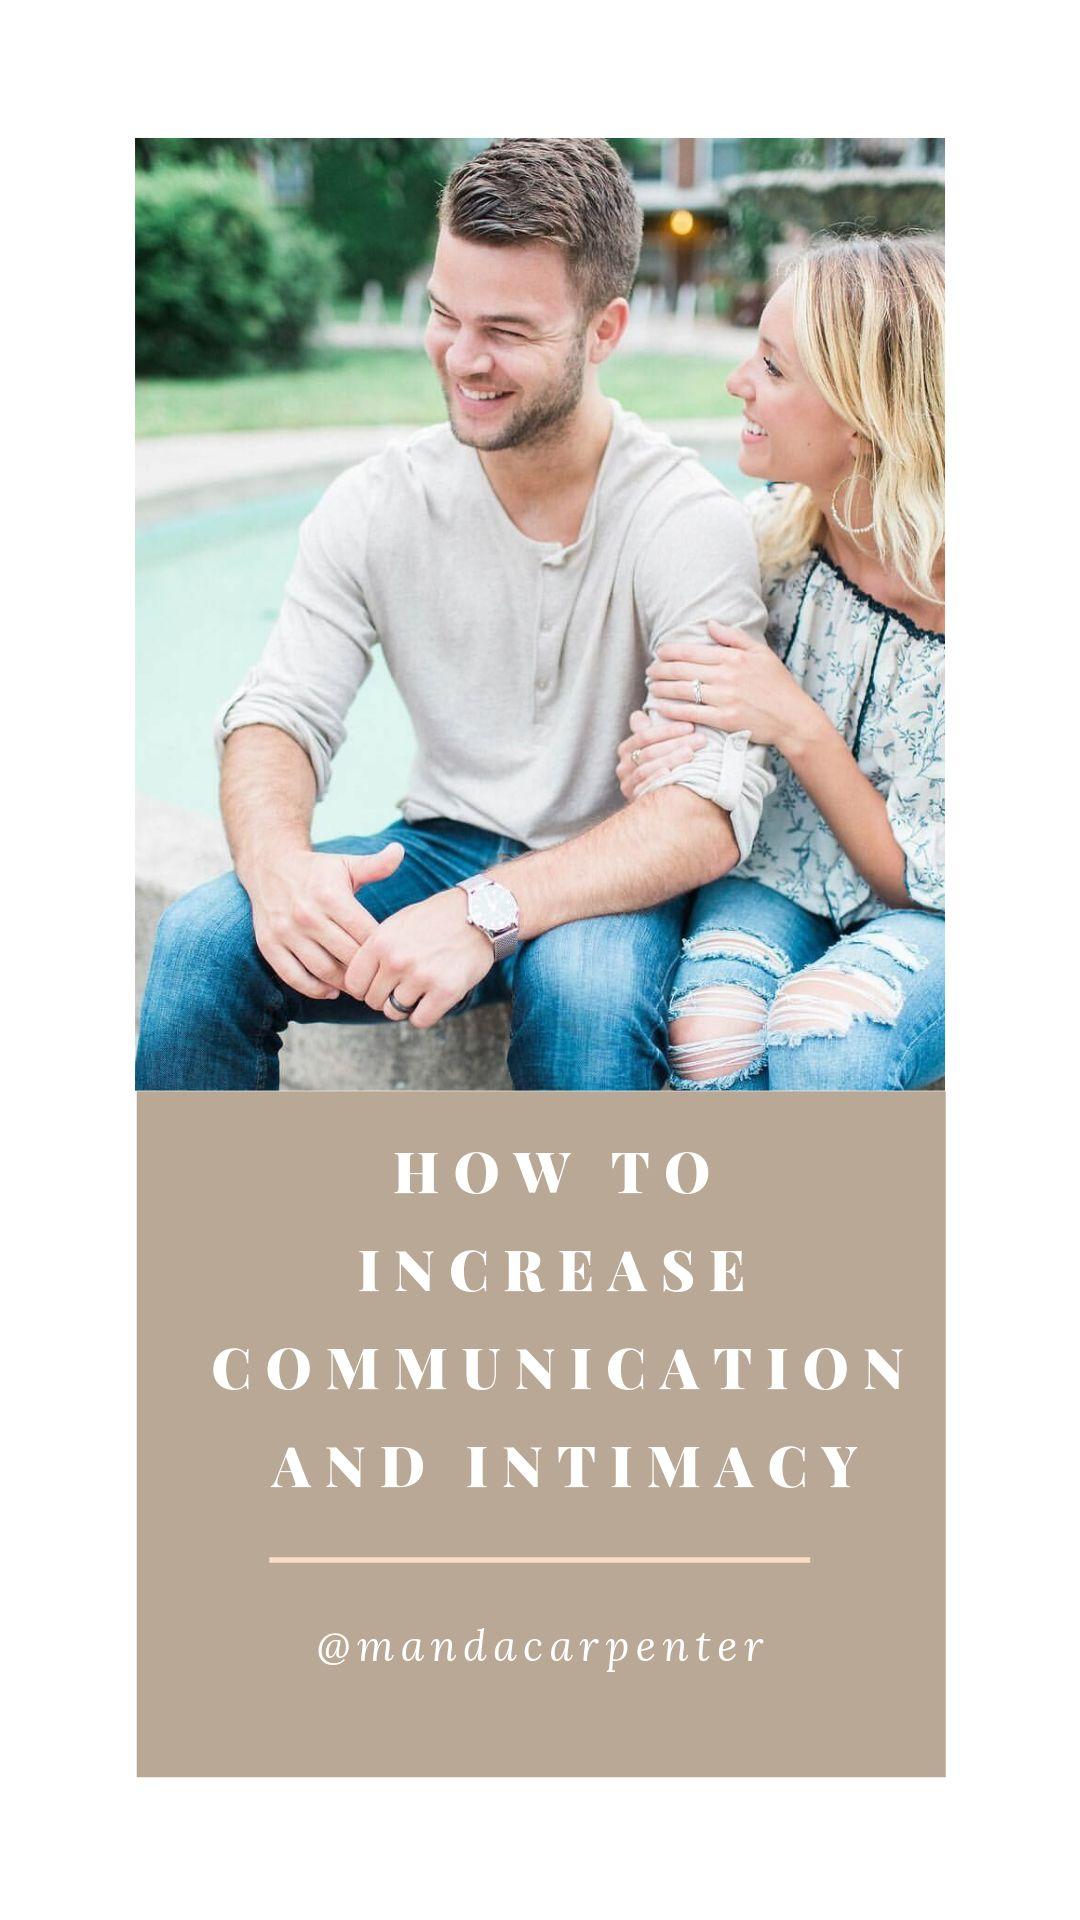 Marriage Intimacy Communication Advice